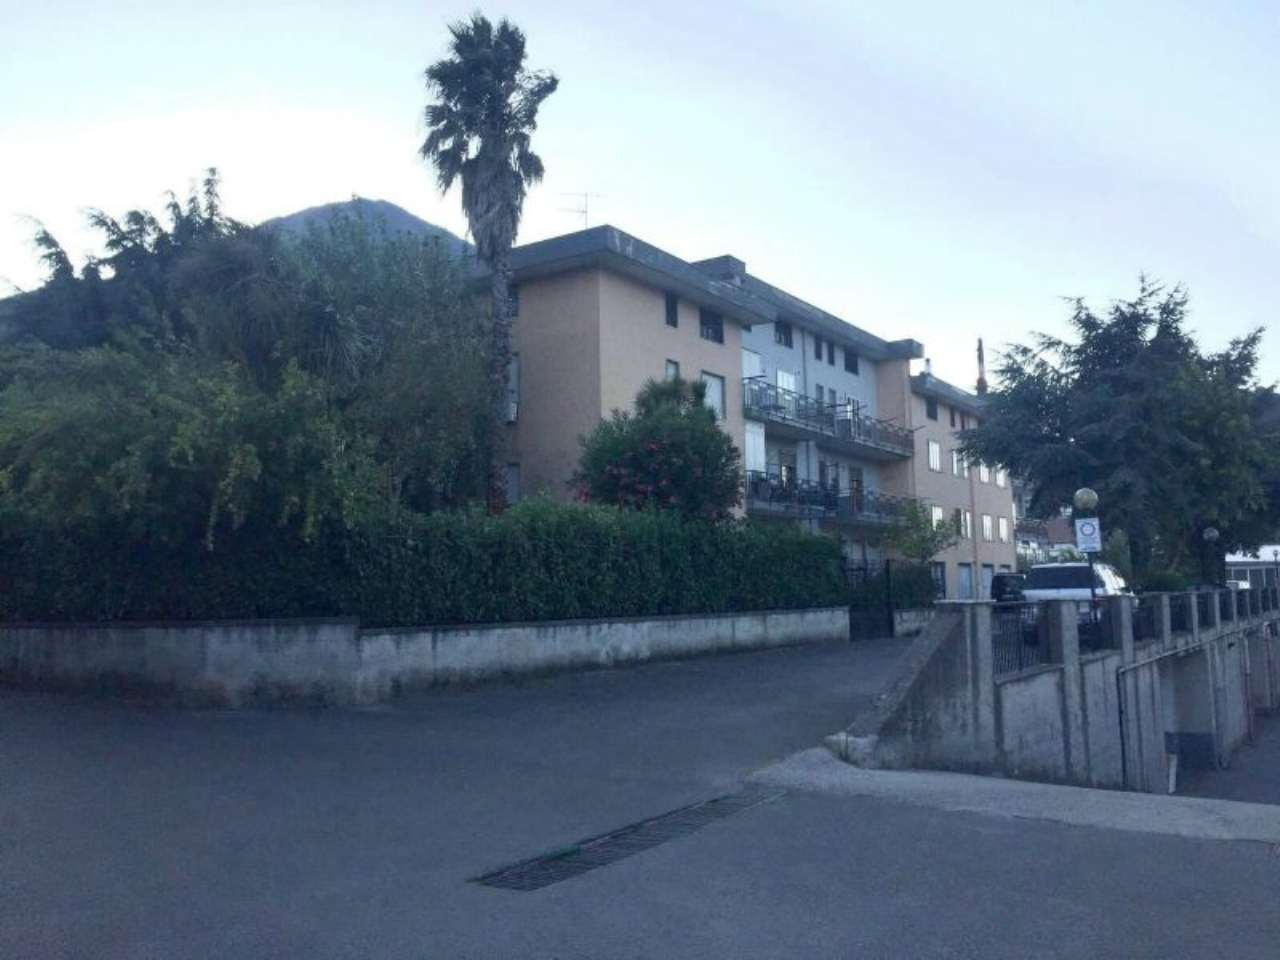 Attico / Mansarda in Vendita a Cava de' Tirreni